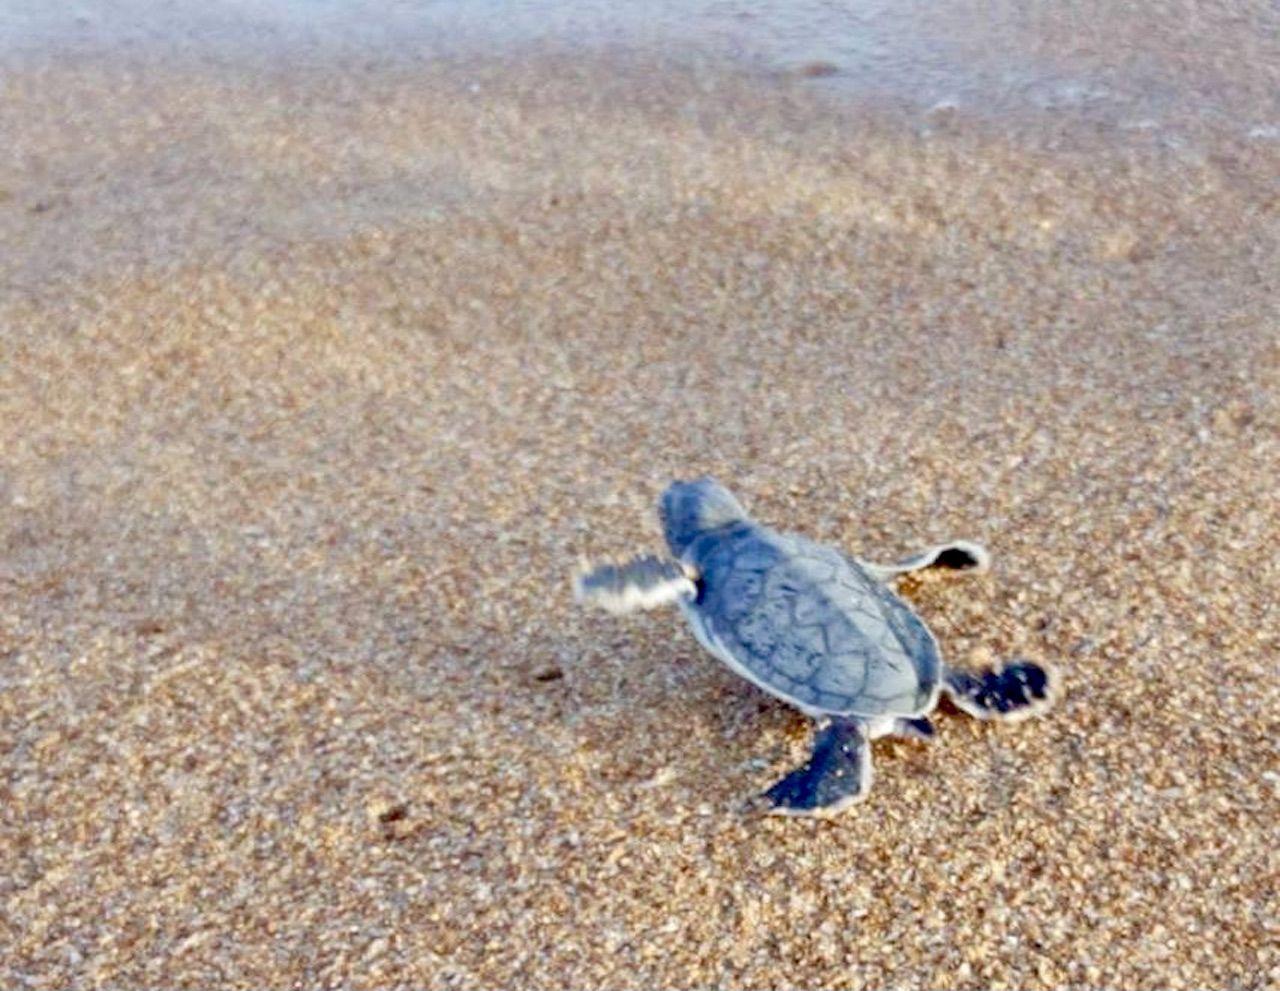 Baby sea turtle scrambles on sand towards the ocean